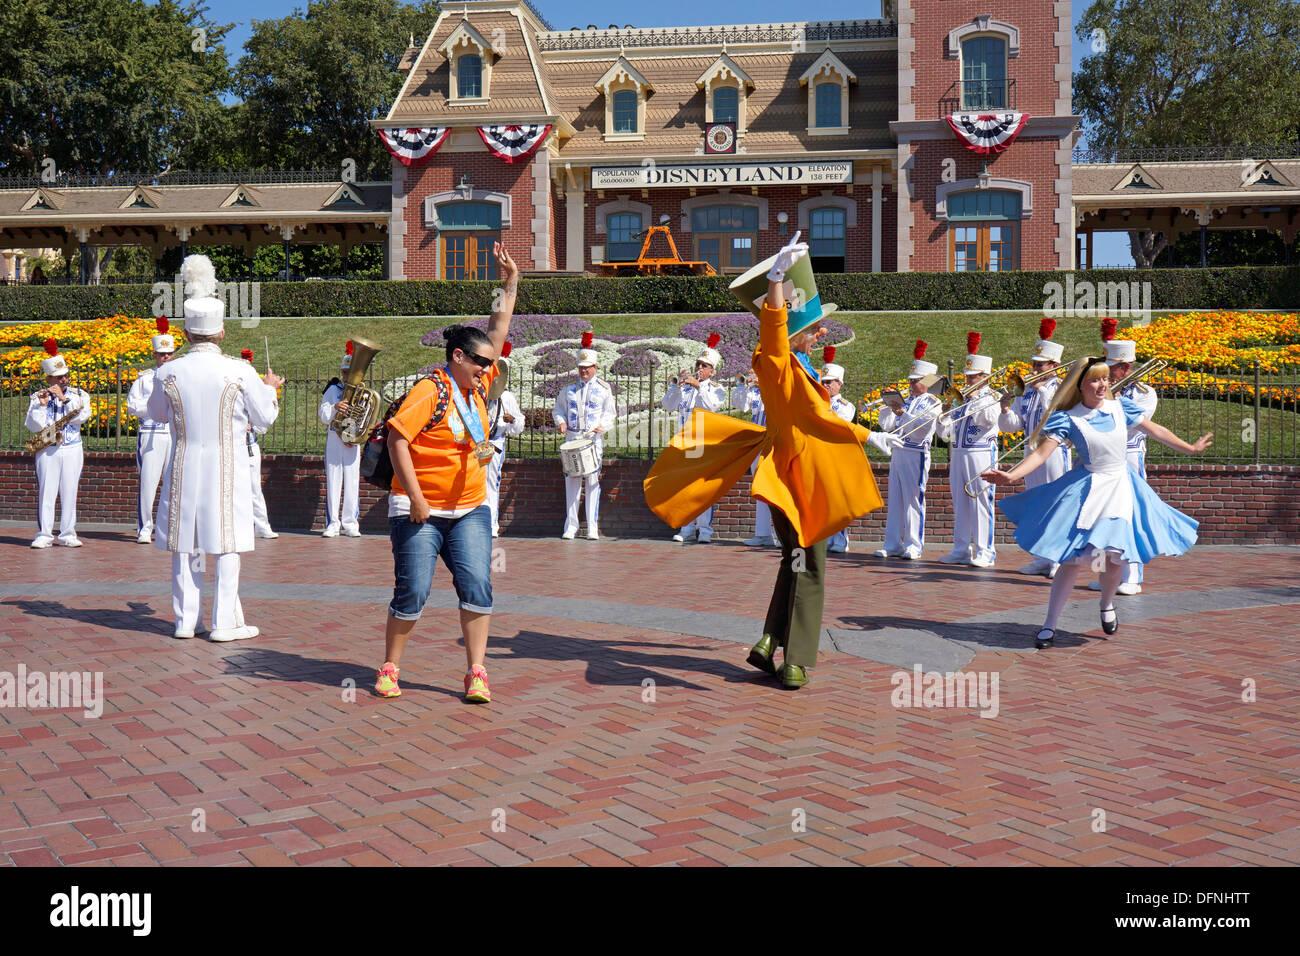 Alice in Wonderland, Mad Hatter, Tourist, Disneyland Resort, Anaheim California - Stock Image